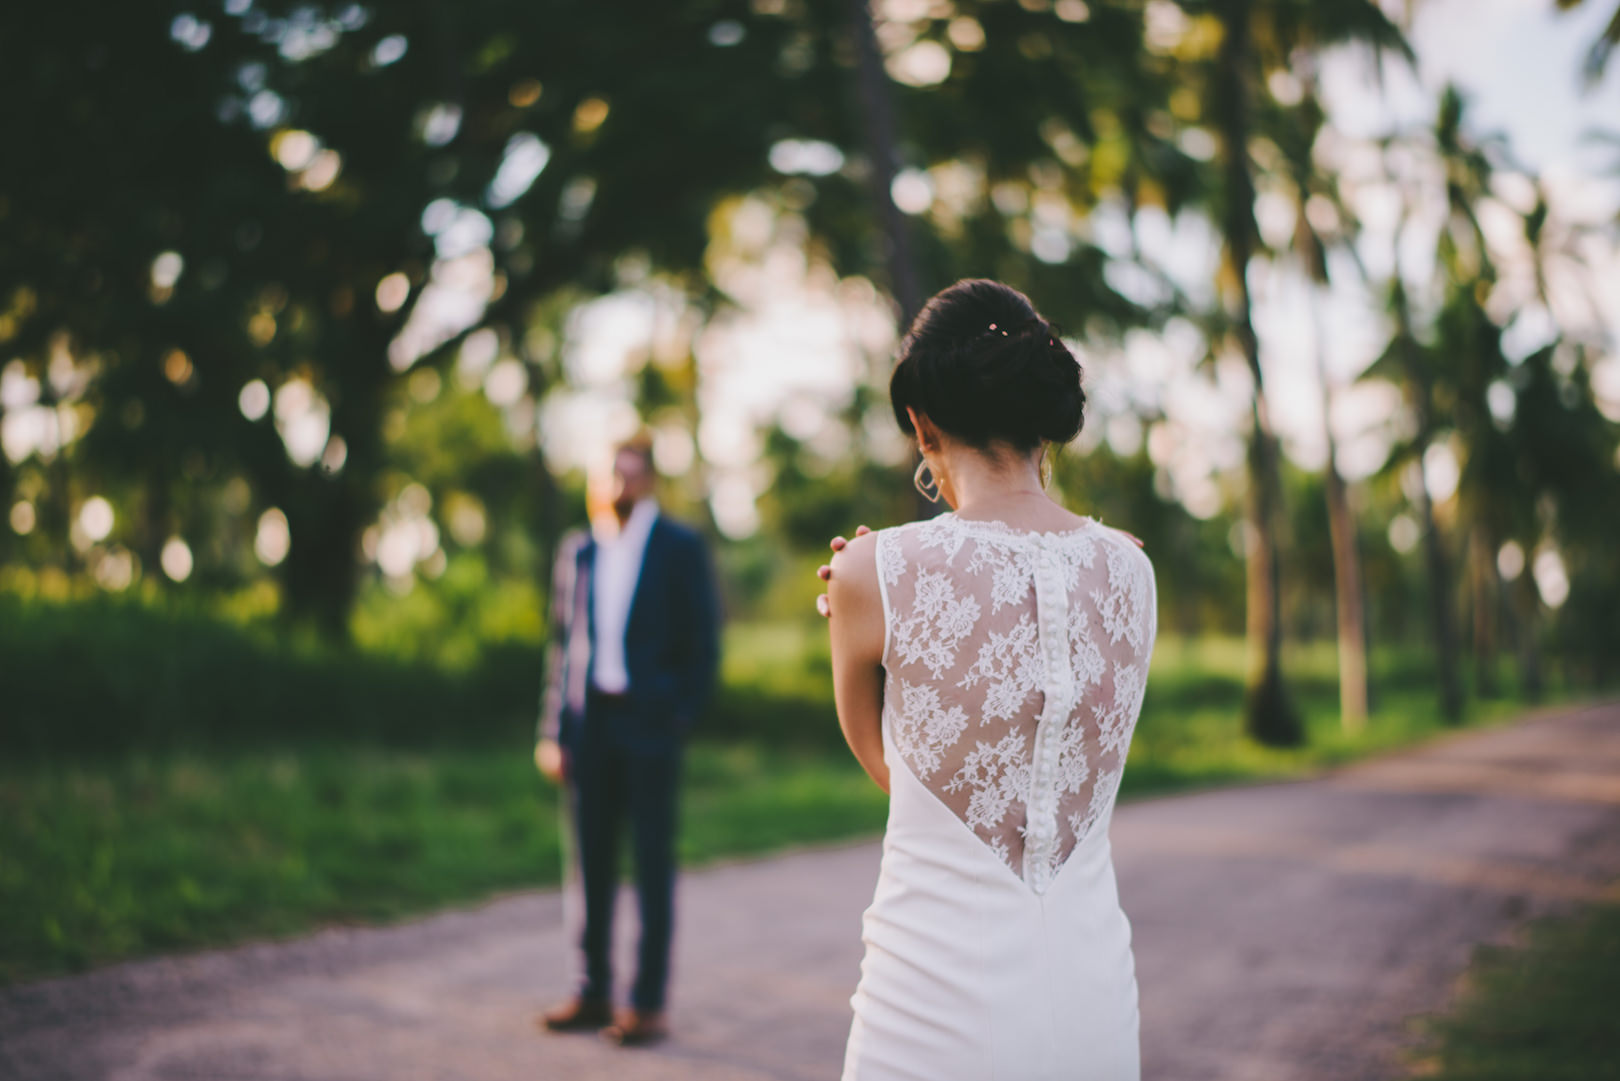 Nathan & Felicia - Wedding Day - © Dallas Kolotylo Photography - 512